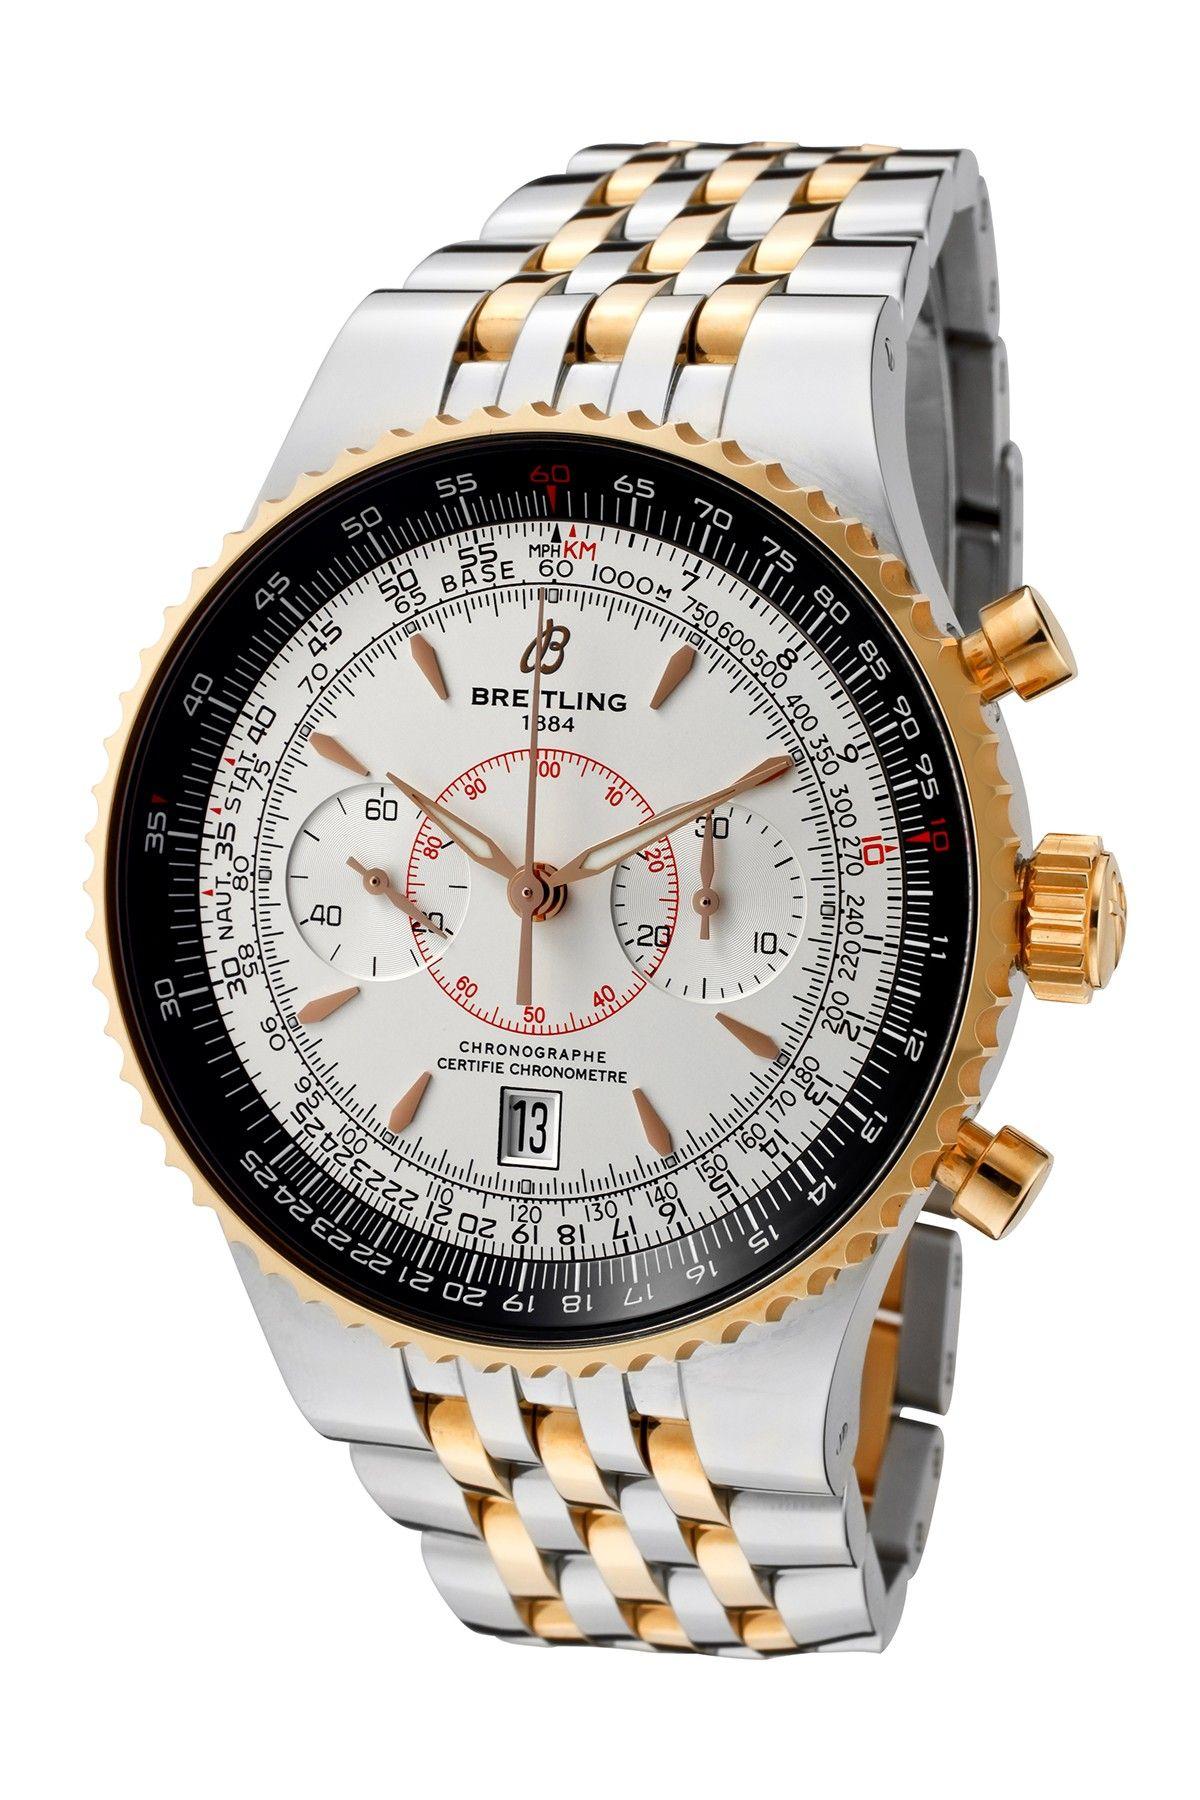 c96e3671f4f Breitling Men s Navitimer Montbrillant Legende Chronograph Watch   Chronograph watch  Sapphire